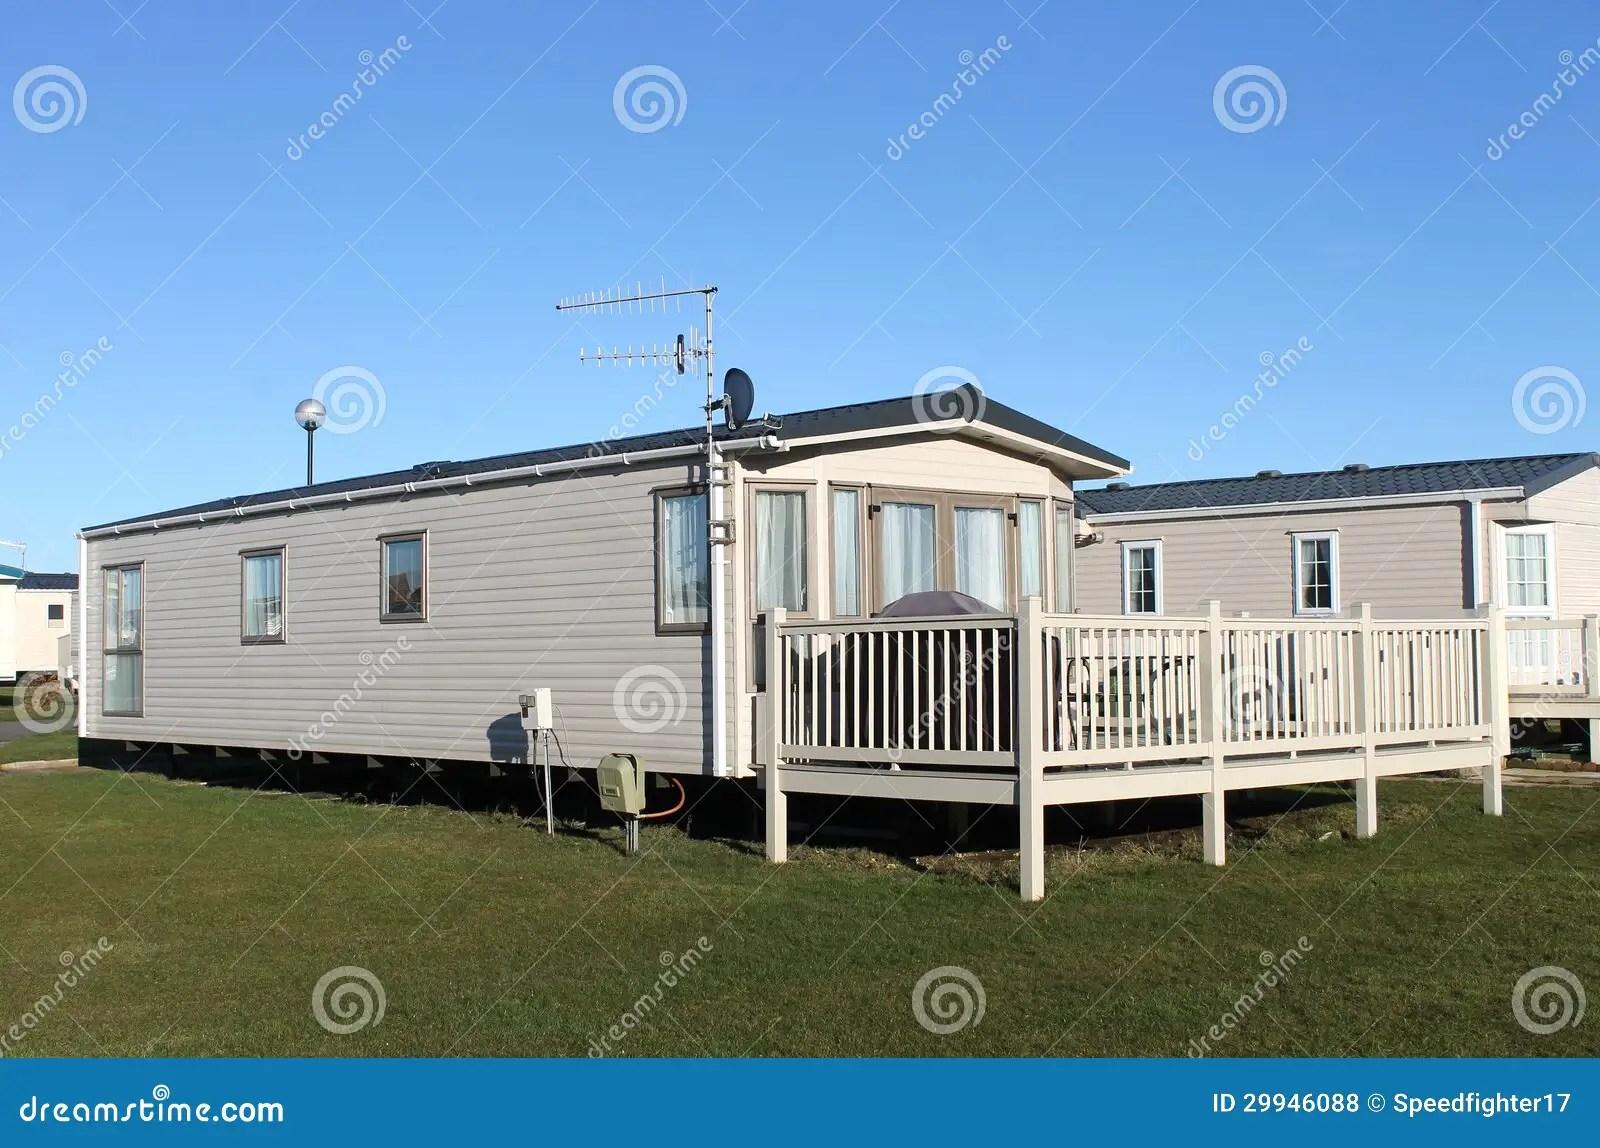 Modern Caravan Home In Trailer Park Royalty Free Stock